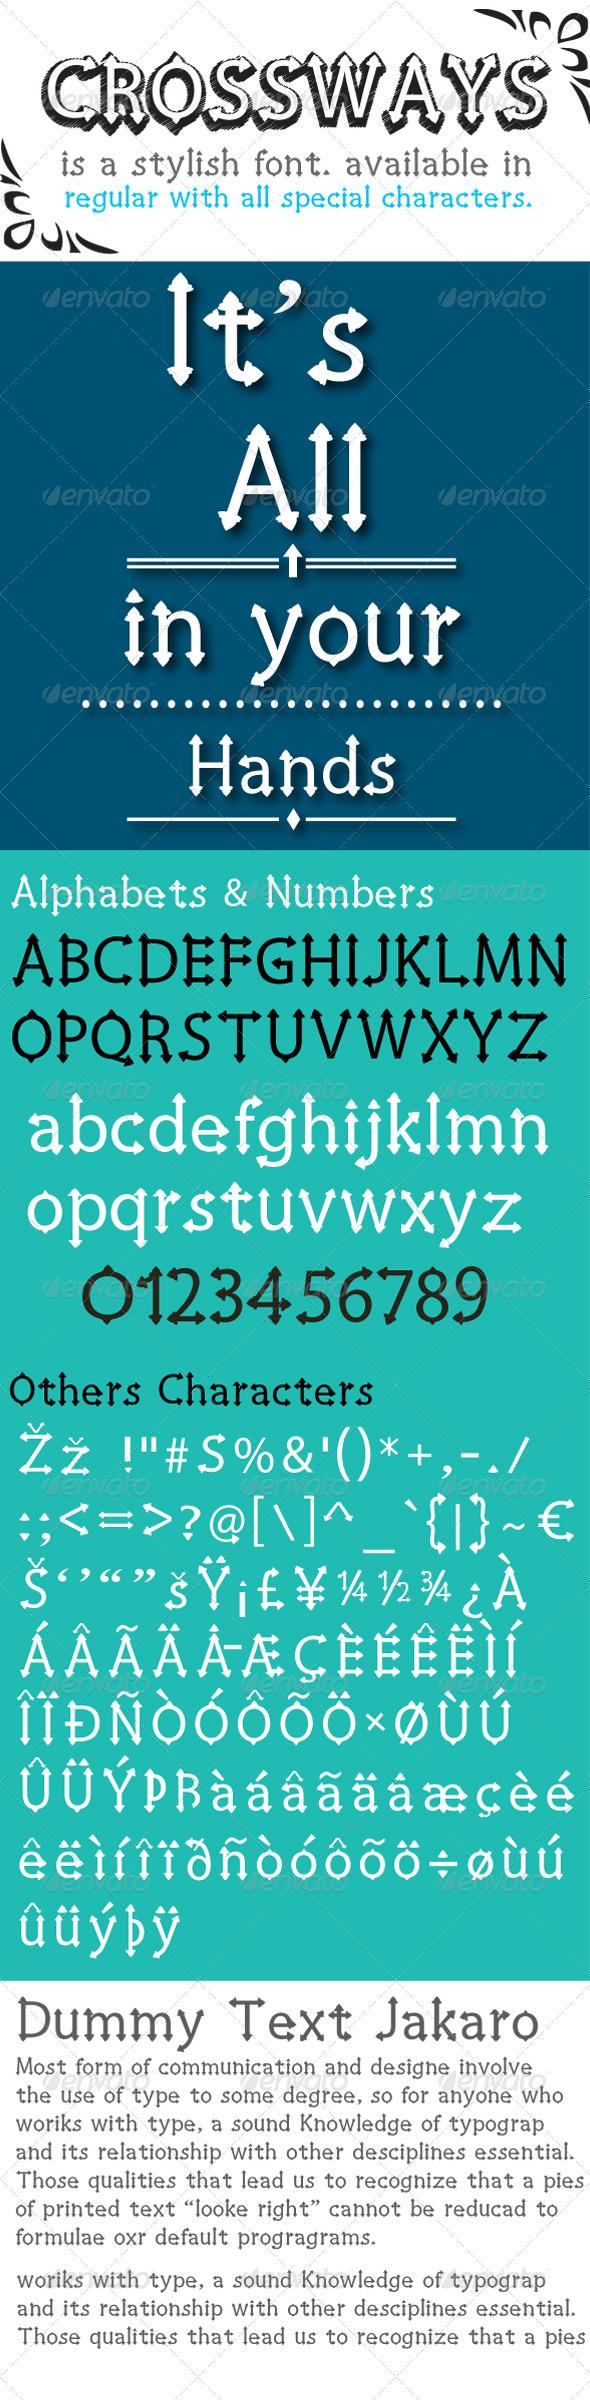 GraphicRiver Crossways Font 7520181